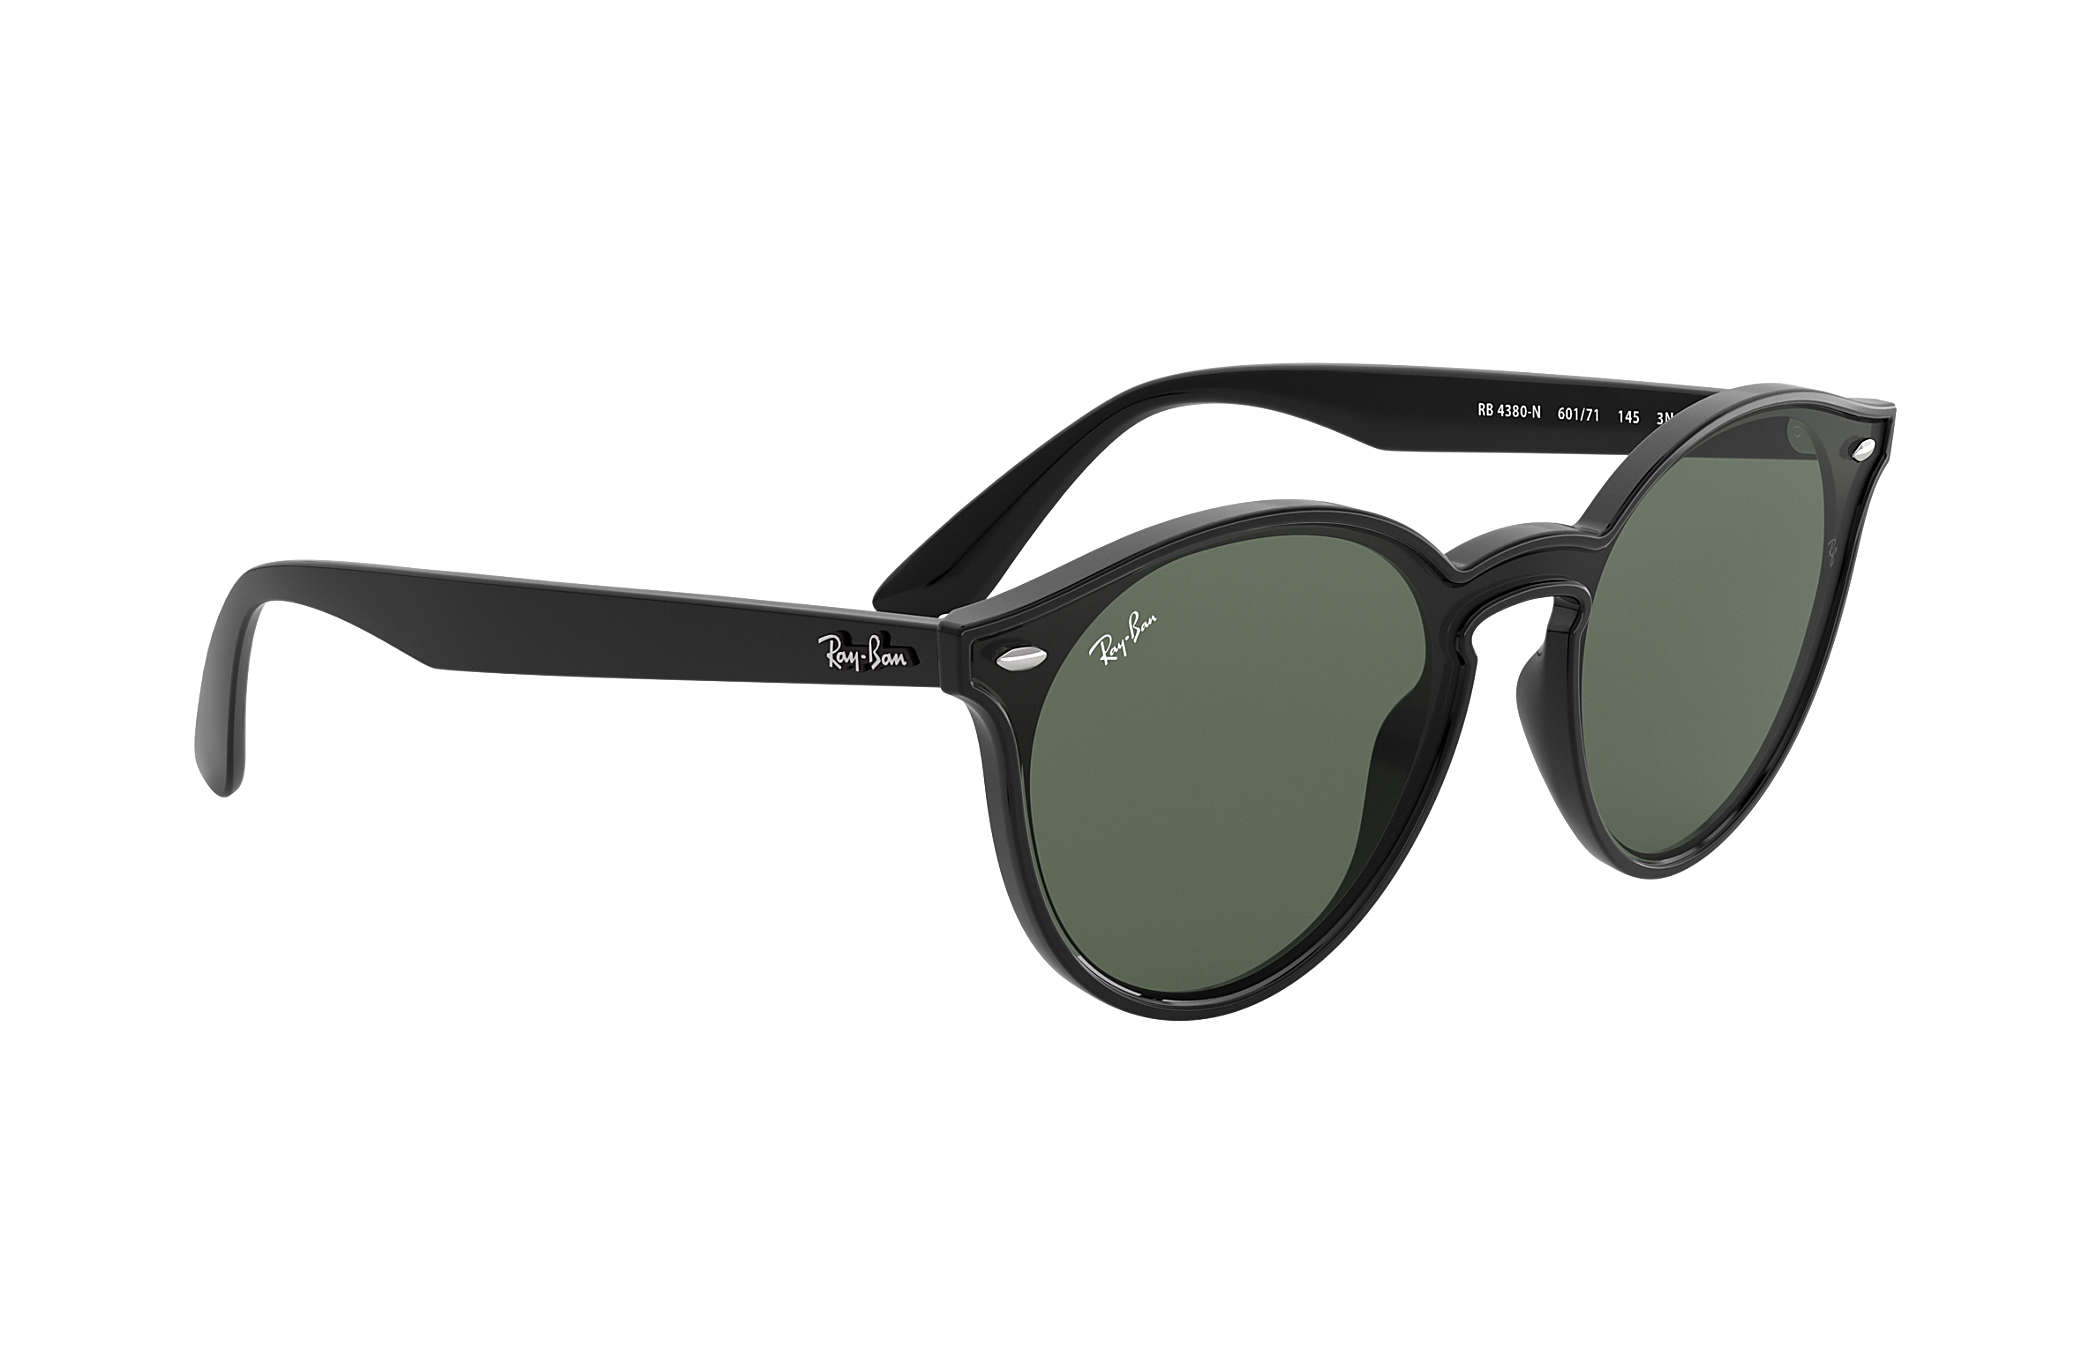 4f082a8d61 Ray-Ban Blaze Rb4380n RB4380N Black - Nylon - Green Lenses ...